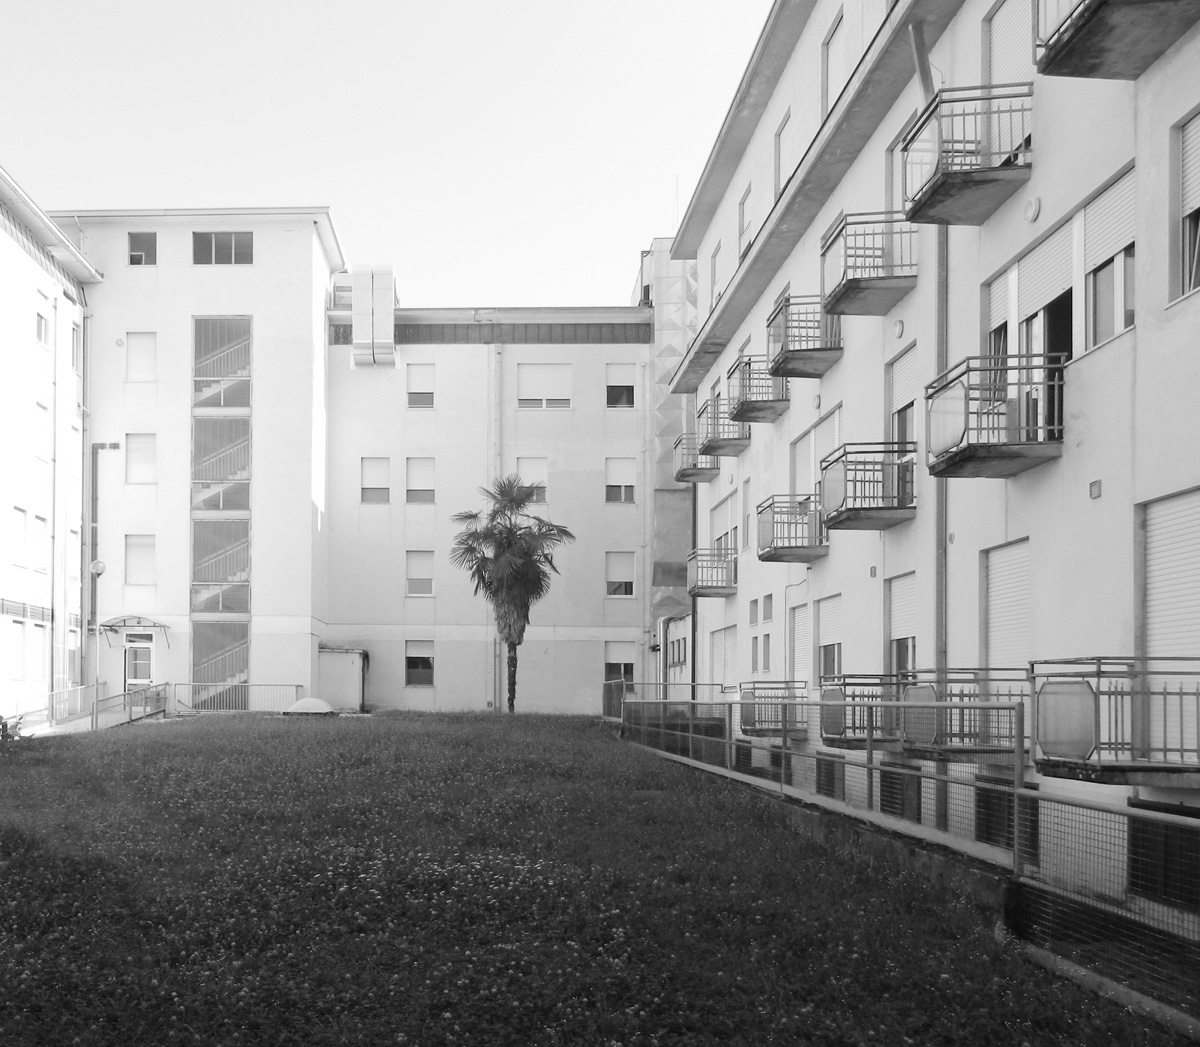 Ospedale Sandrigo - Analisi di vulnerabilità sismica